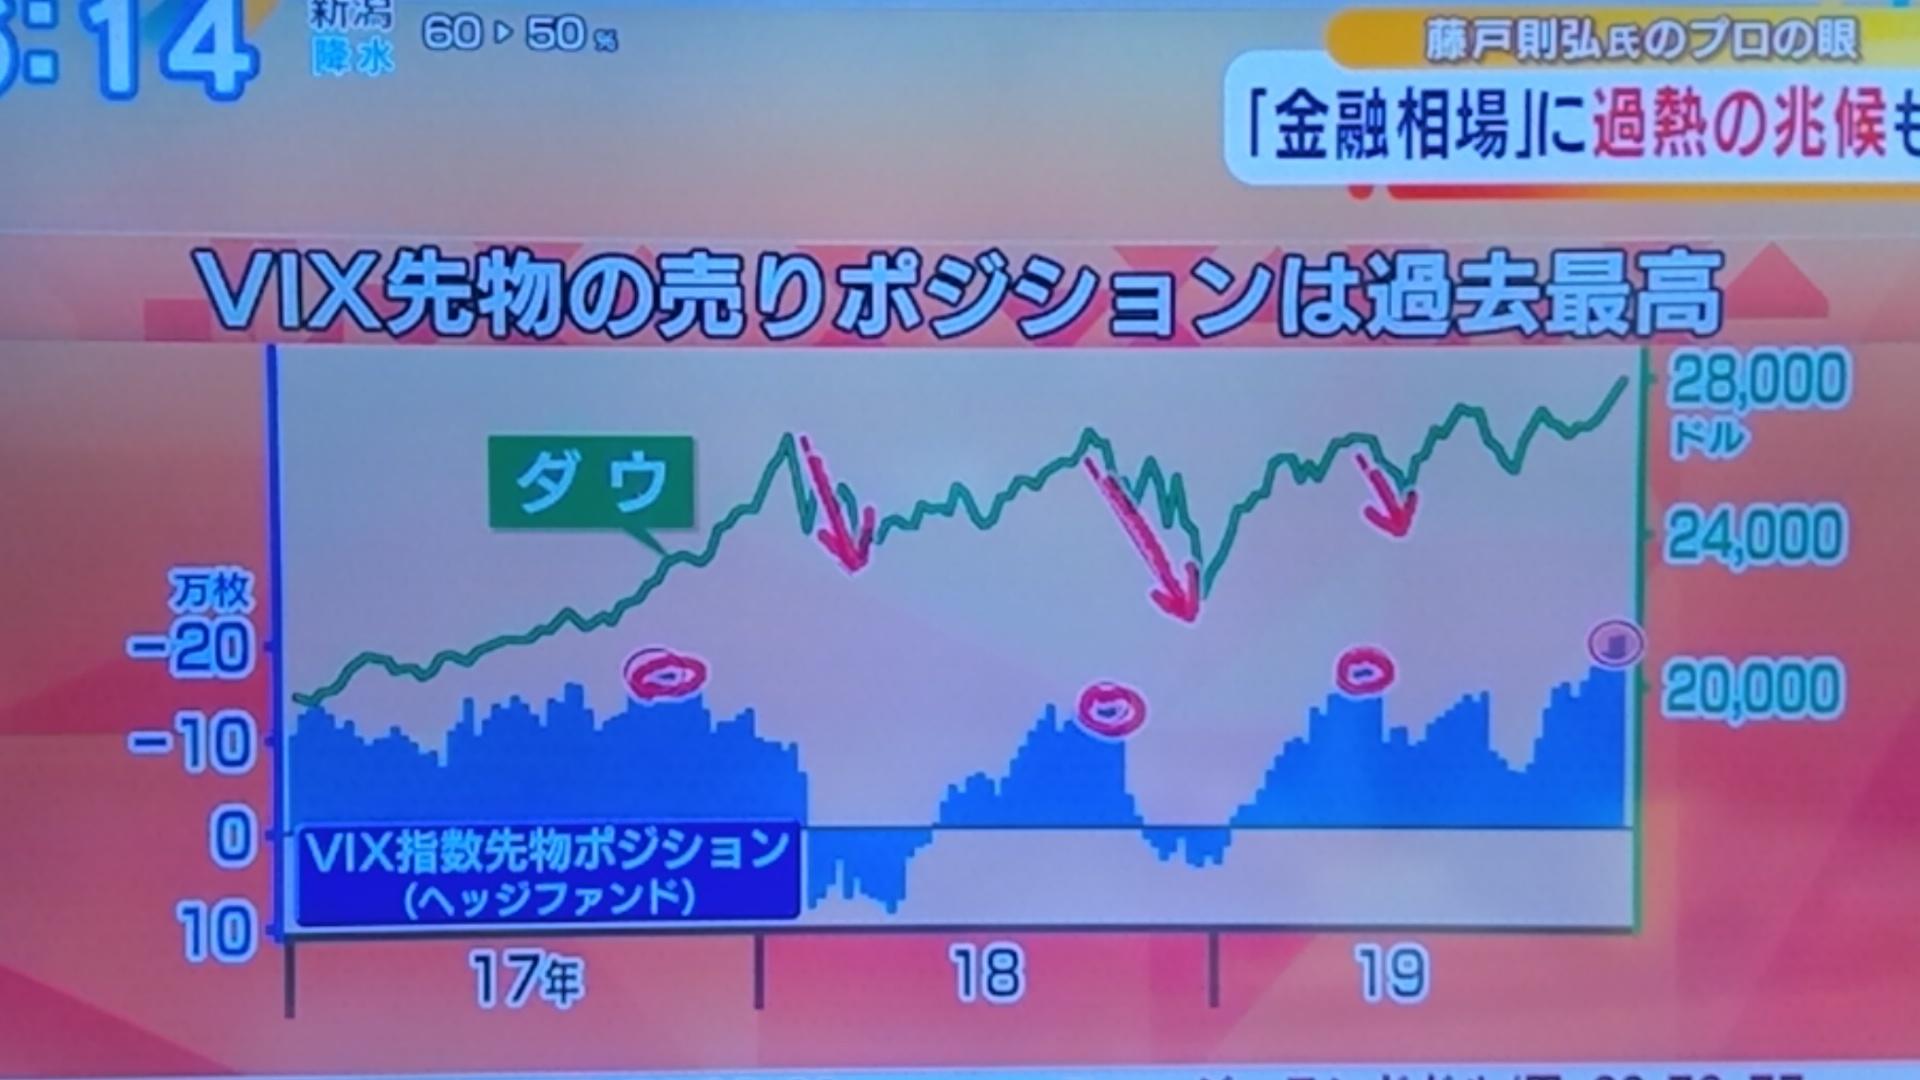 VIXで見る金融の行方_d0262085_09241977.jpg